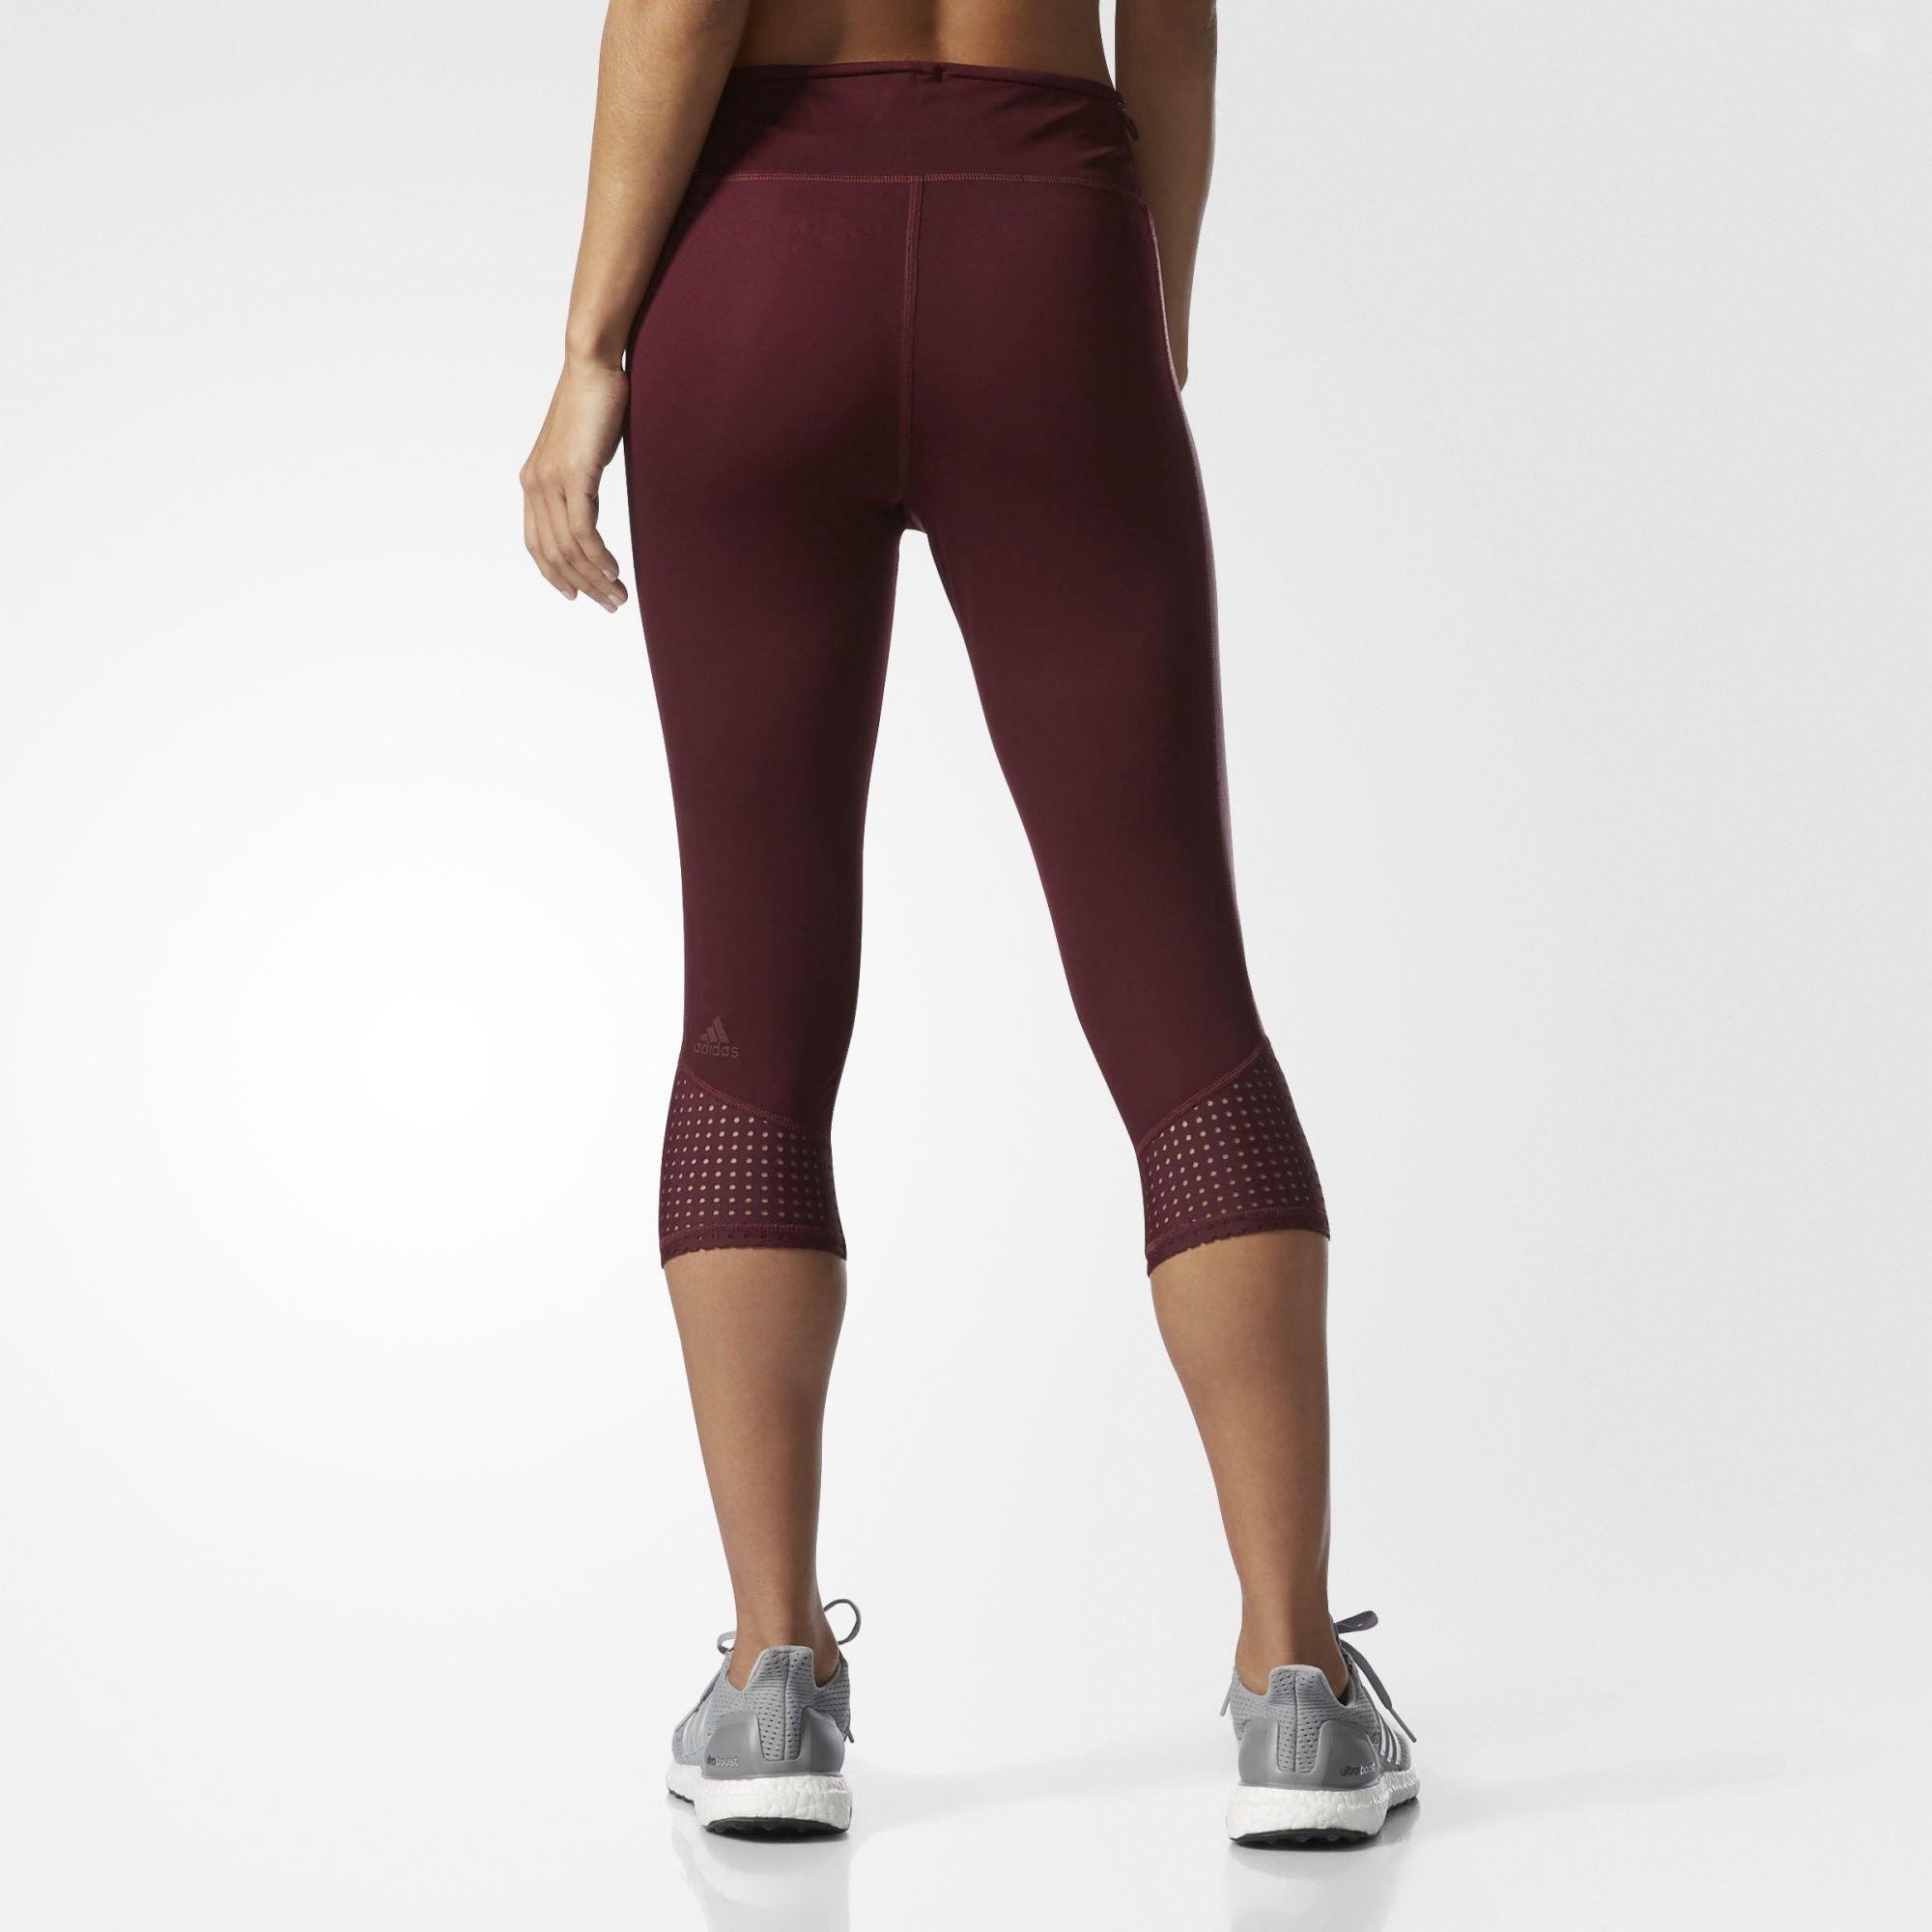 Adidas Men's Supernova Three-Quarter Length Running Tights Gym Yoga Pants NEW